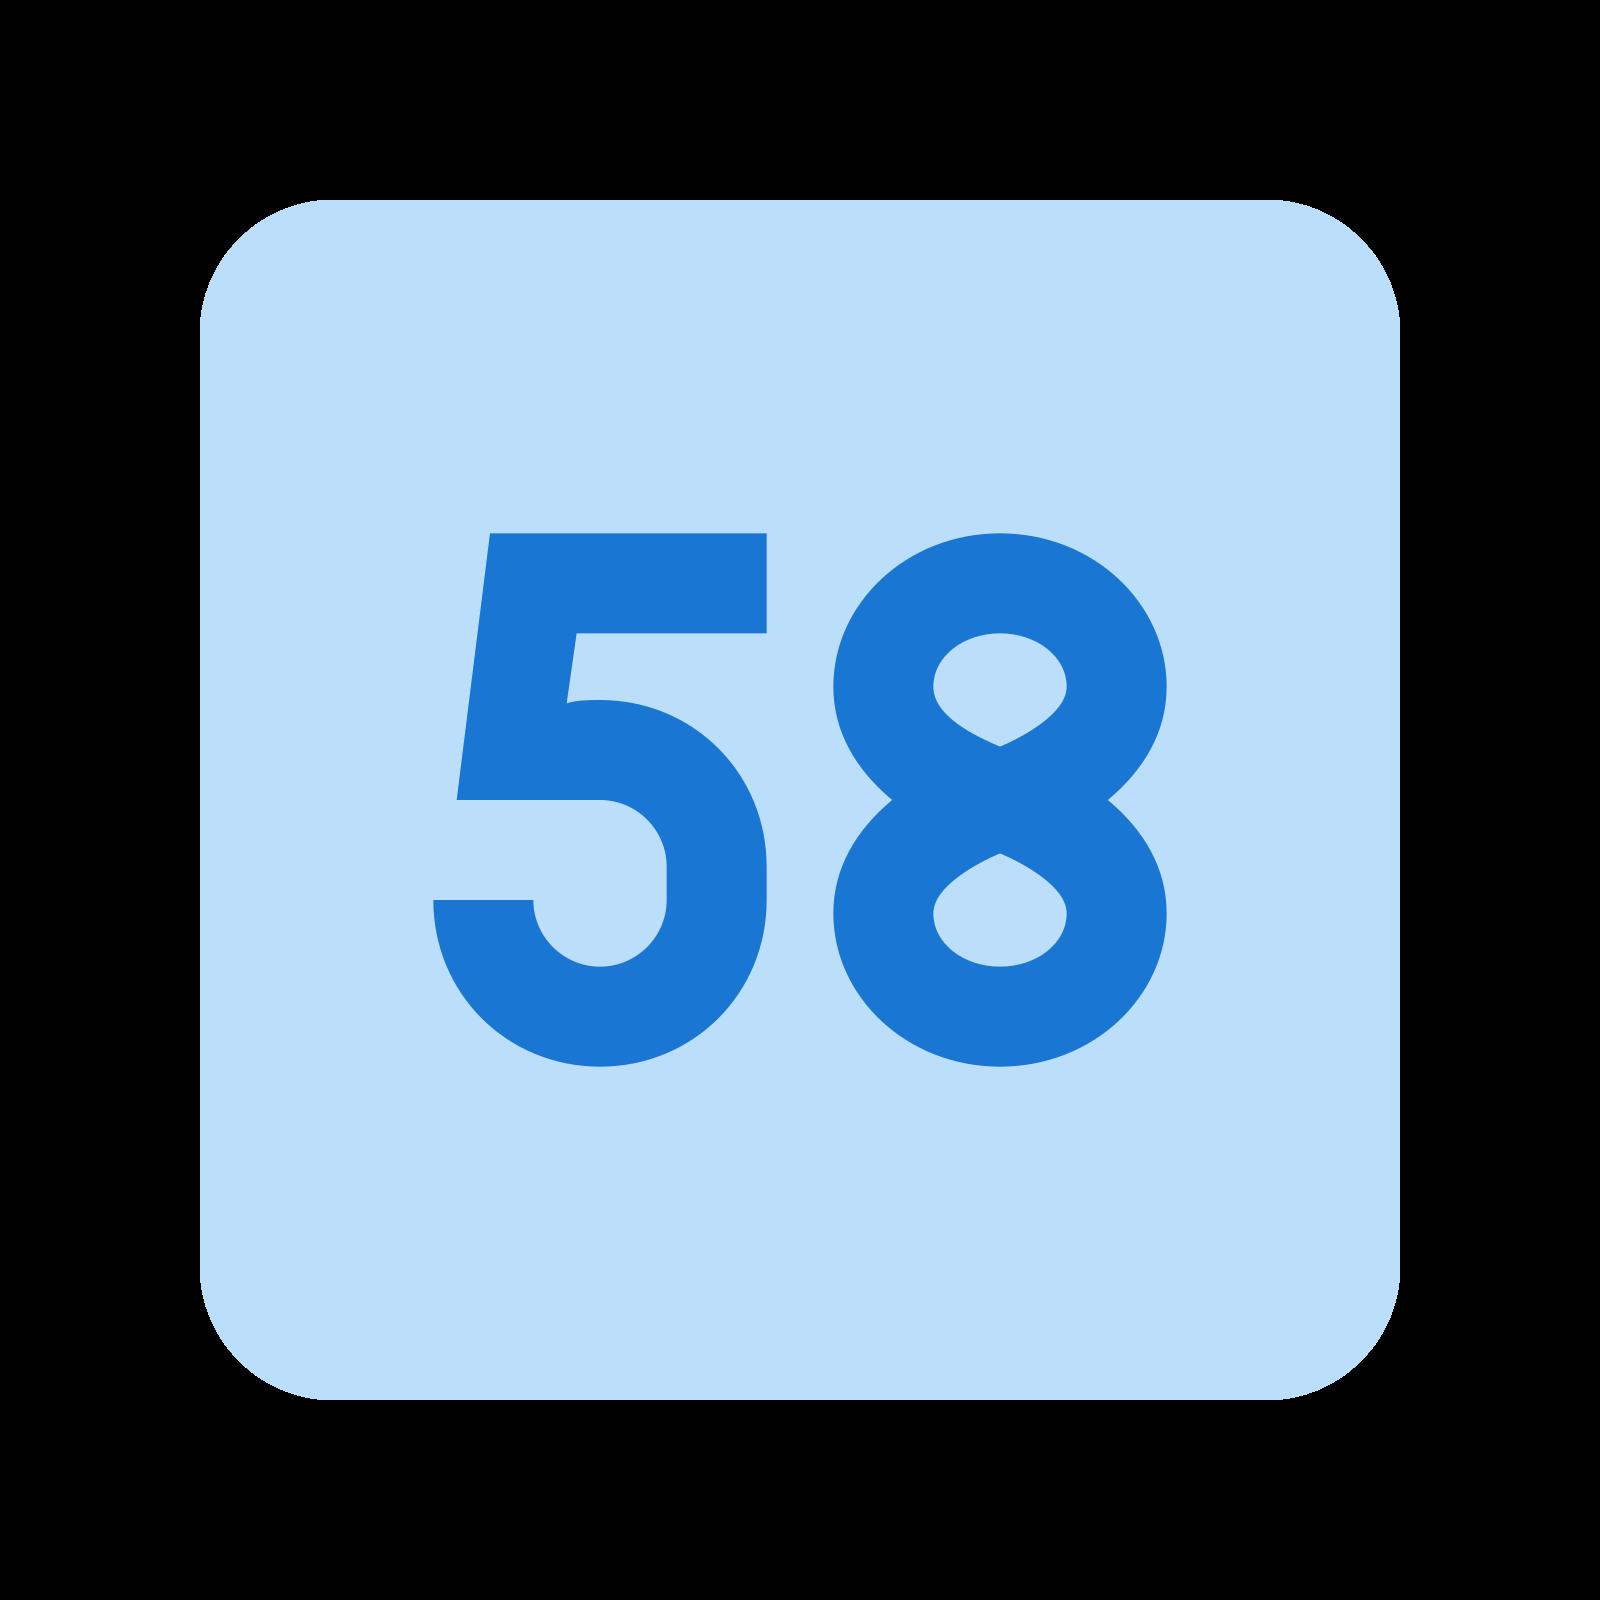 58 icon